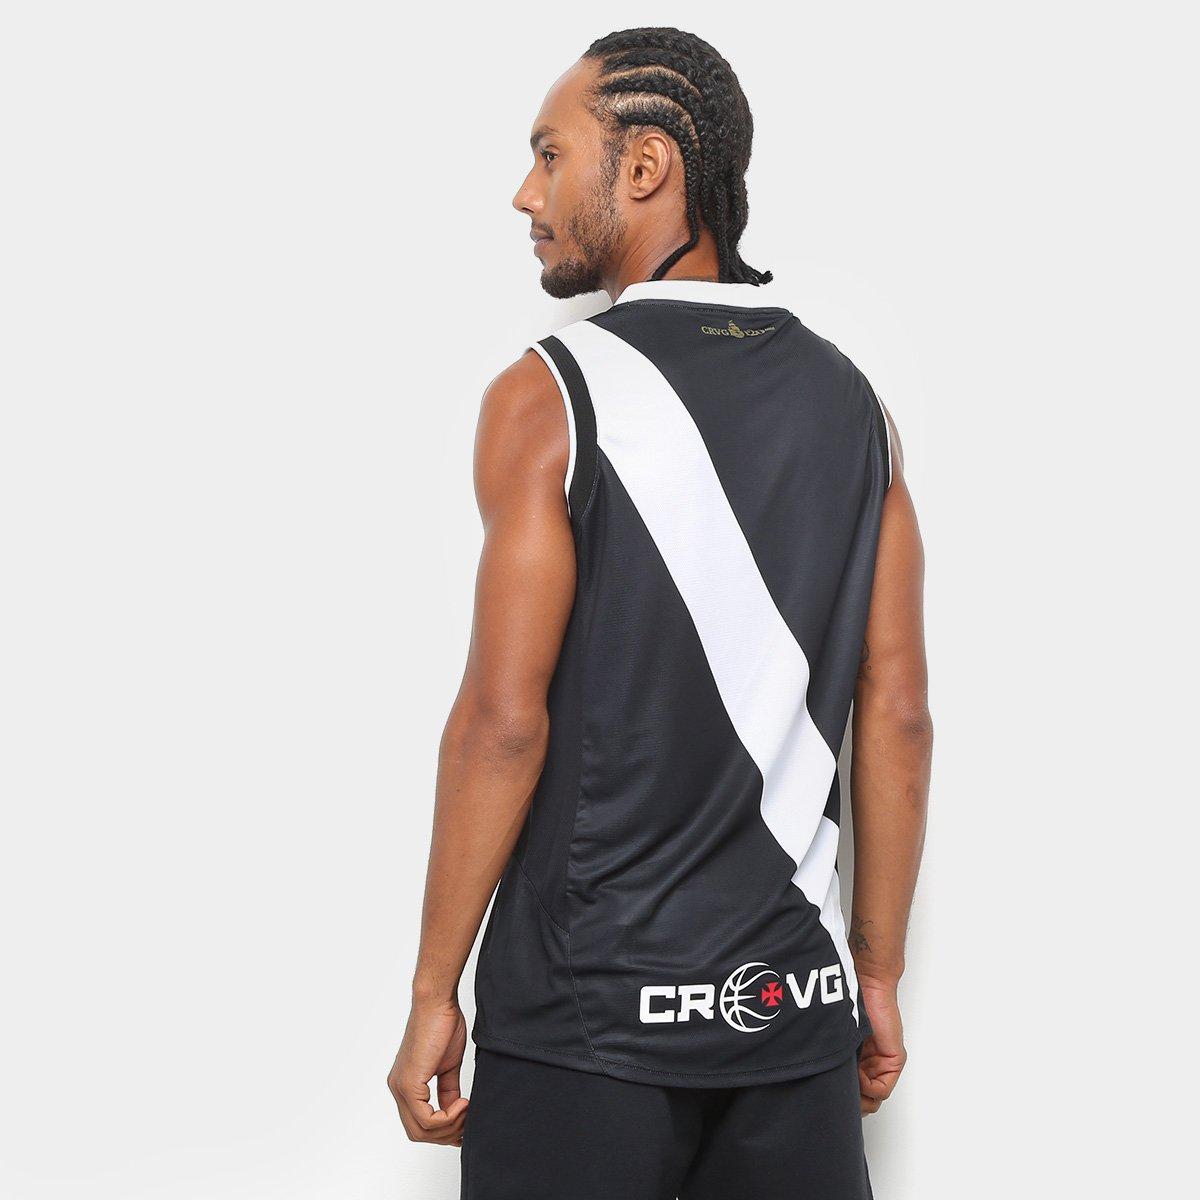 a14dde533a Camiseta Regata Vasco I Basquete Diadora 2018 Masculina - Compre ...